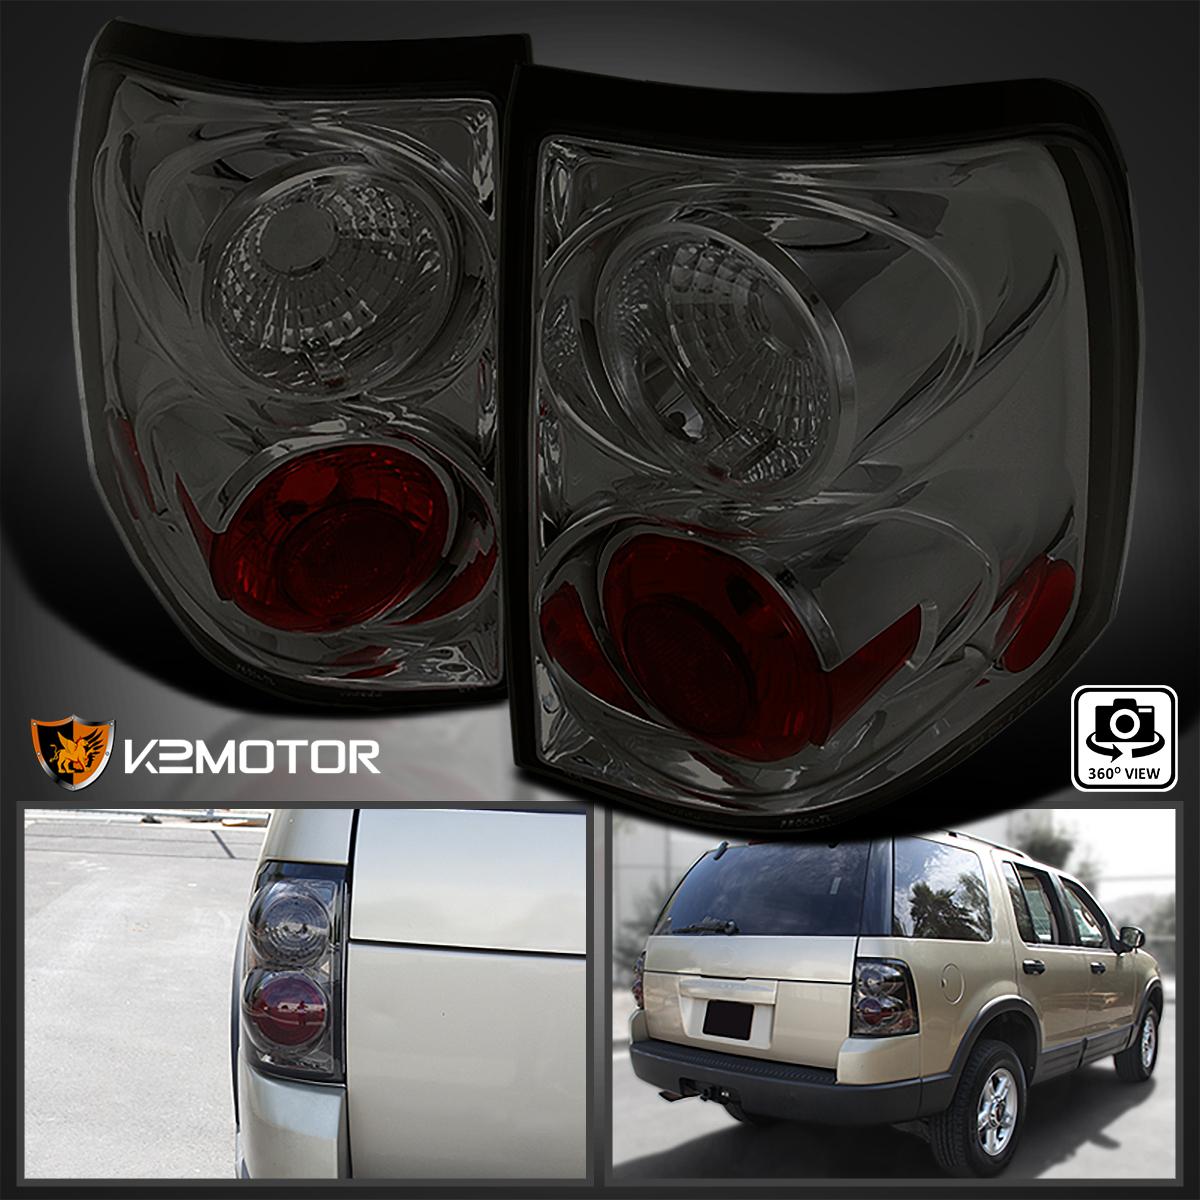 Spec-D Tuning LT-EPOR02G-TM Ford Explorer Xlt Xls Smoked Lens Altezza Tail Lights